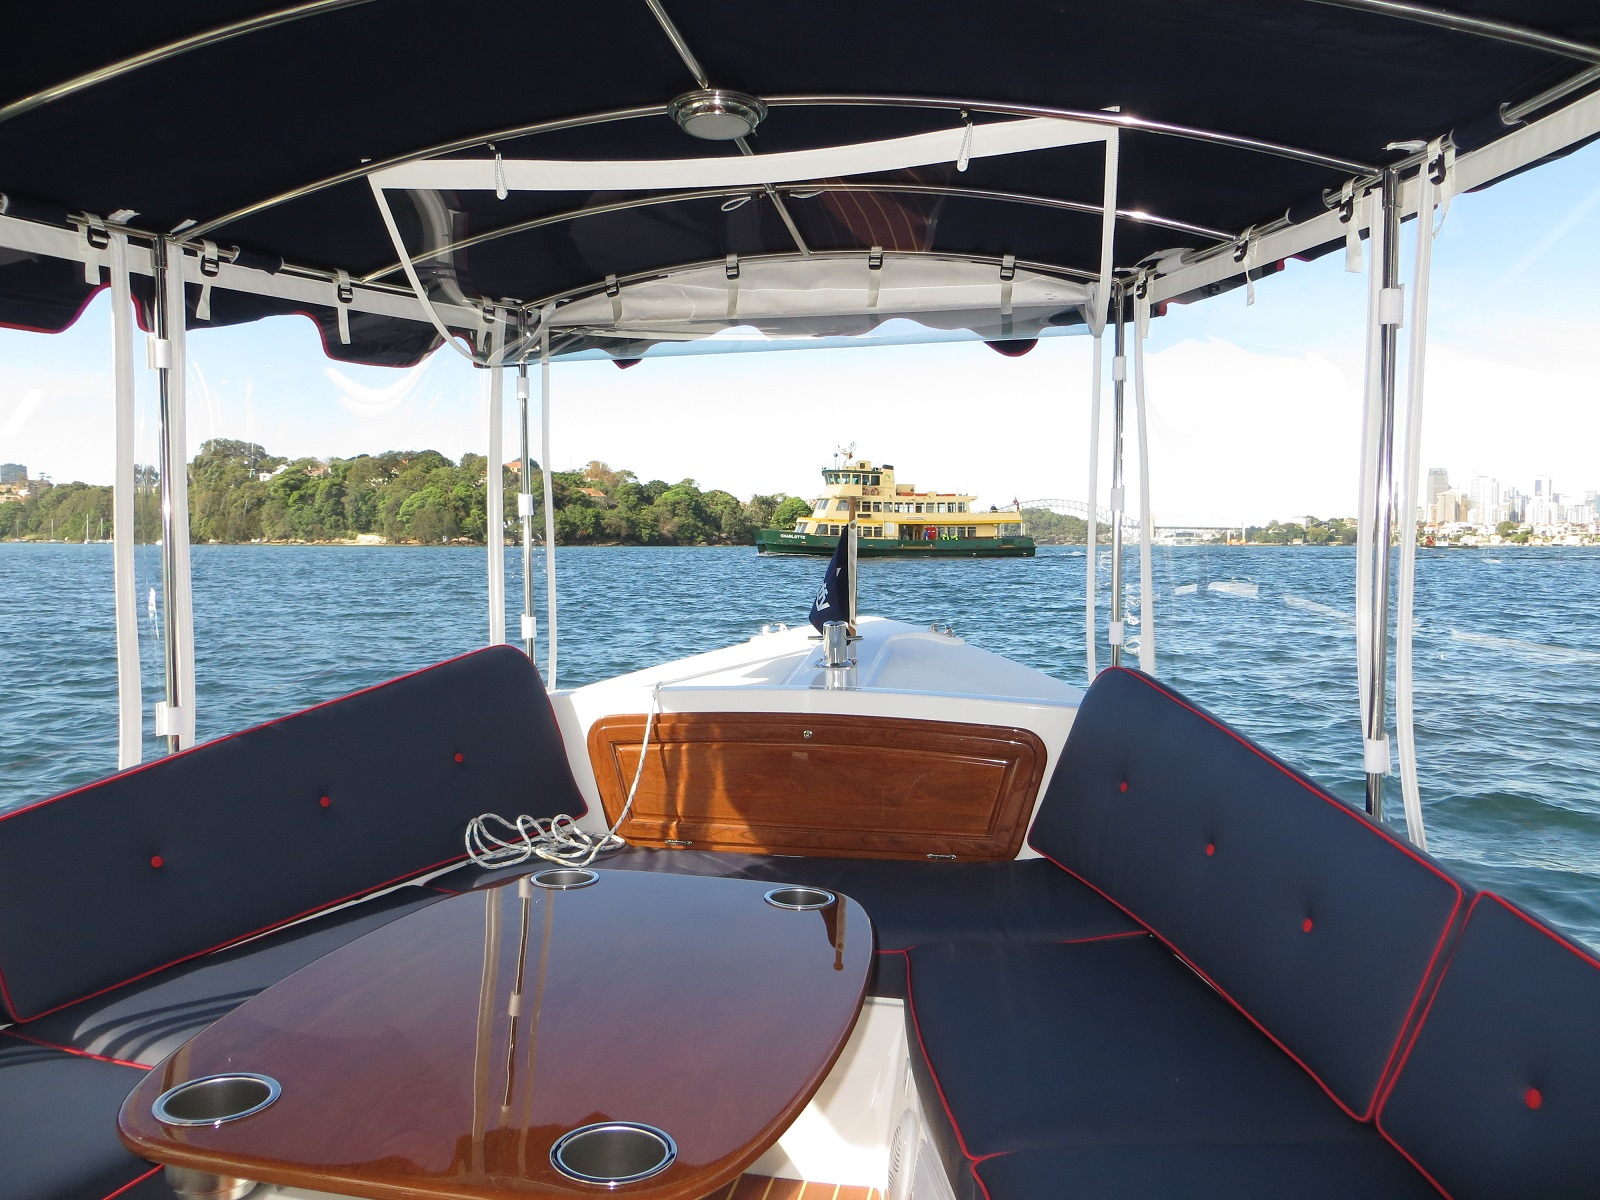 New Duffy 22 Suncruiser Launches In Australia Eco Boats